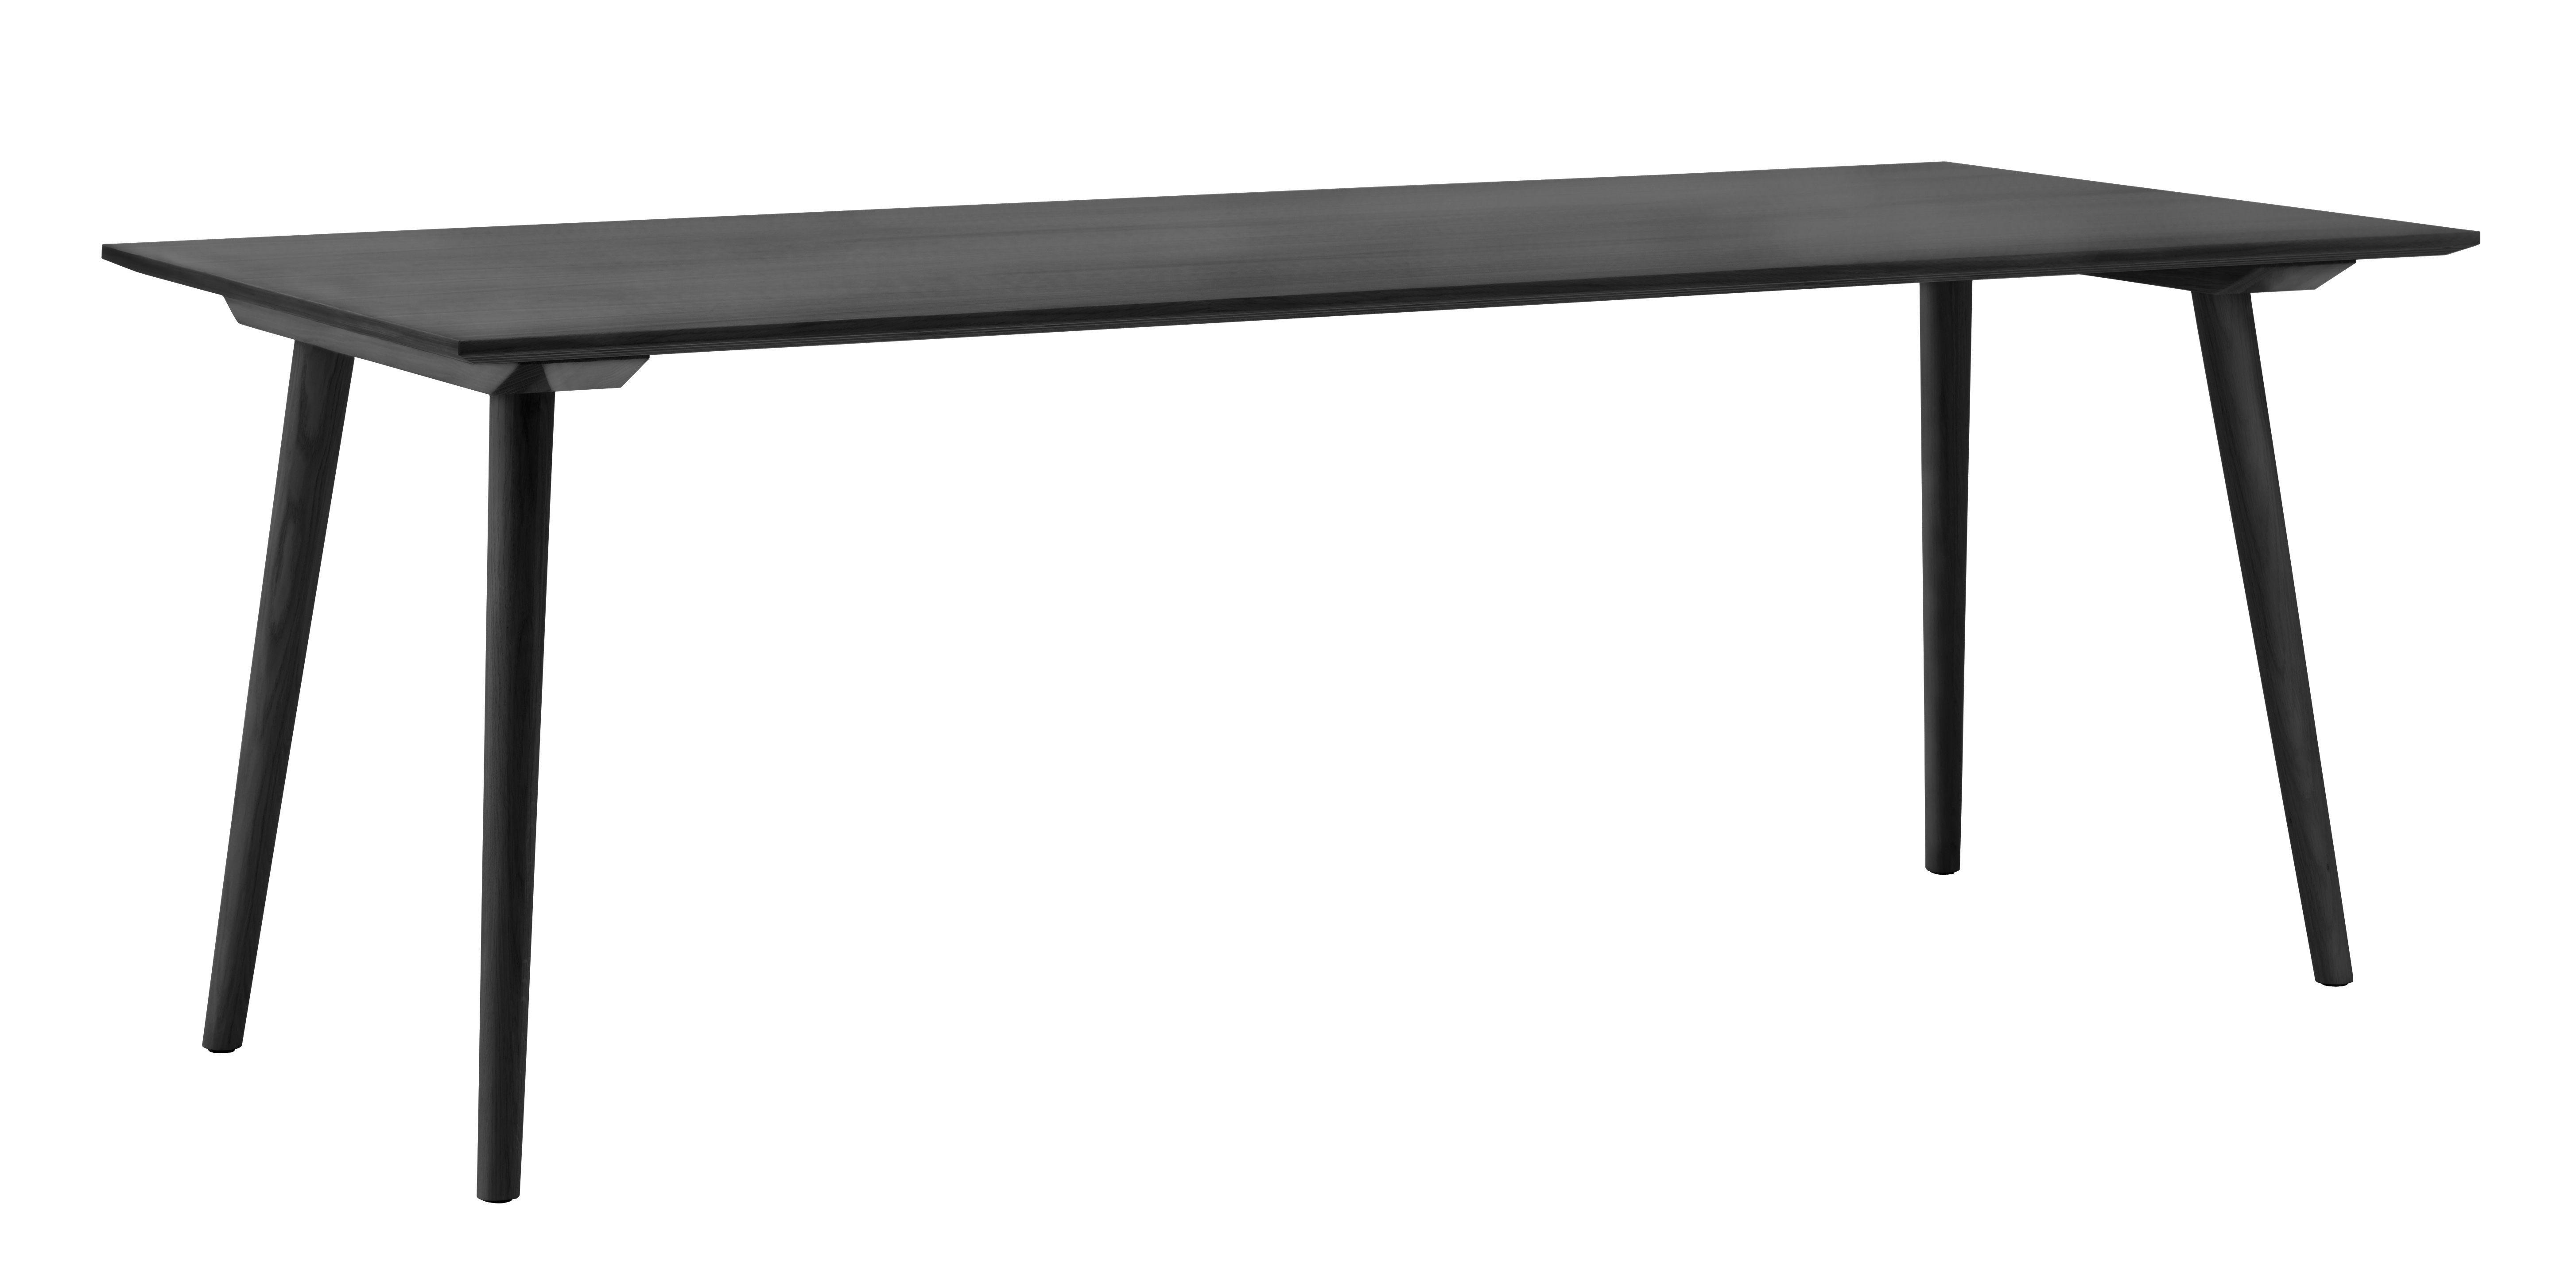 Table rectangulaire In Between SK5 / 90 x 200 cm - Chêne - &tradition noir en bois